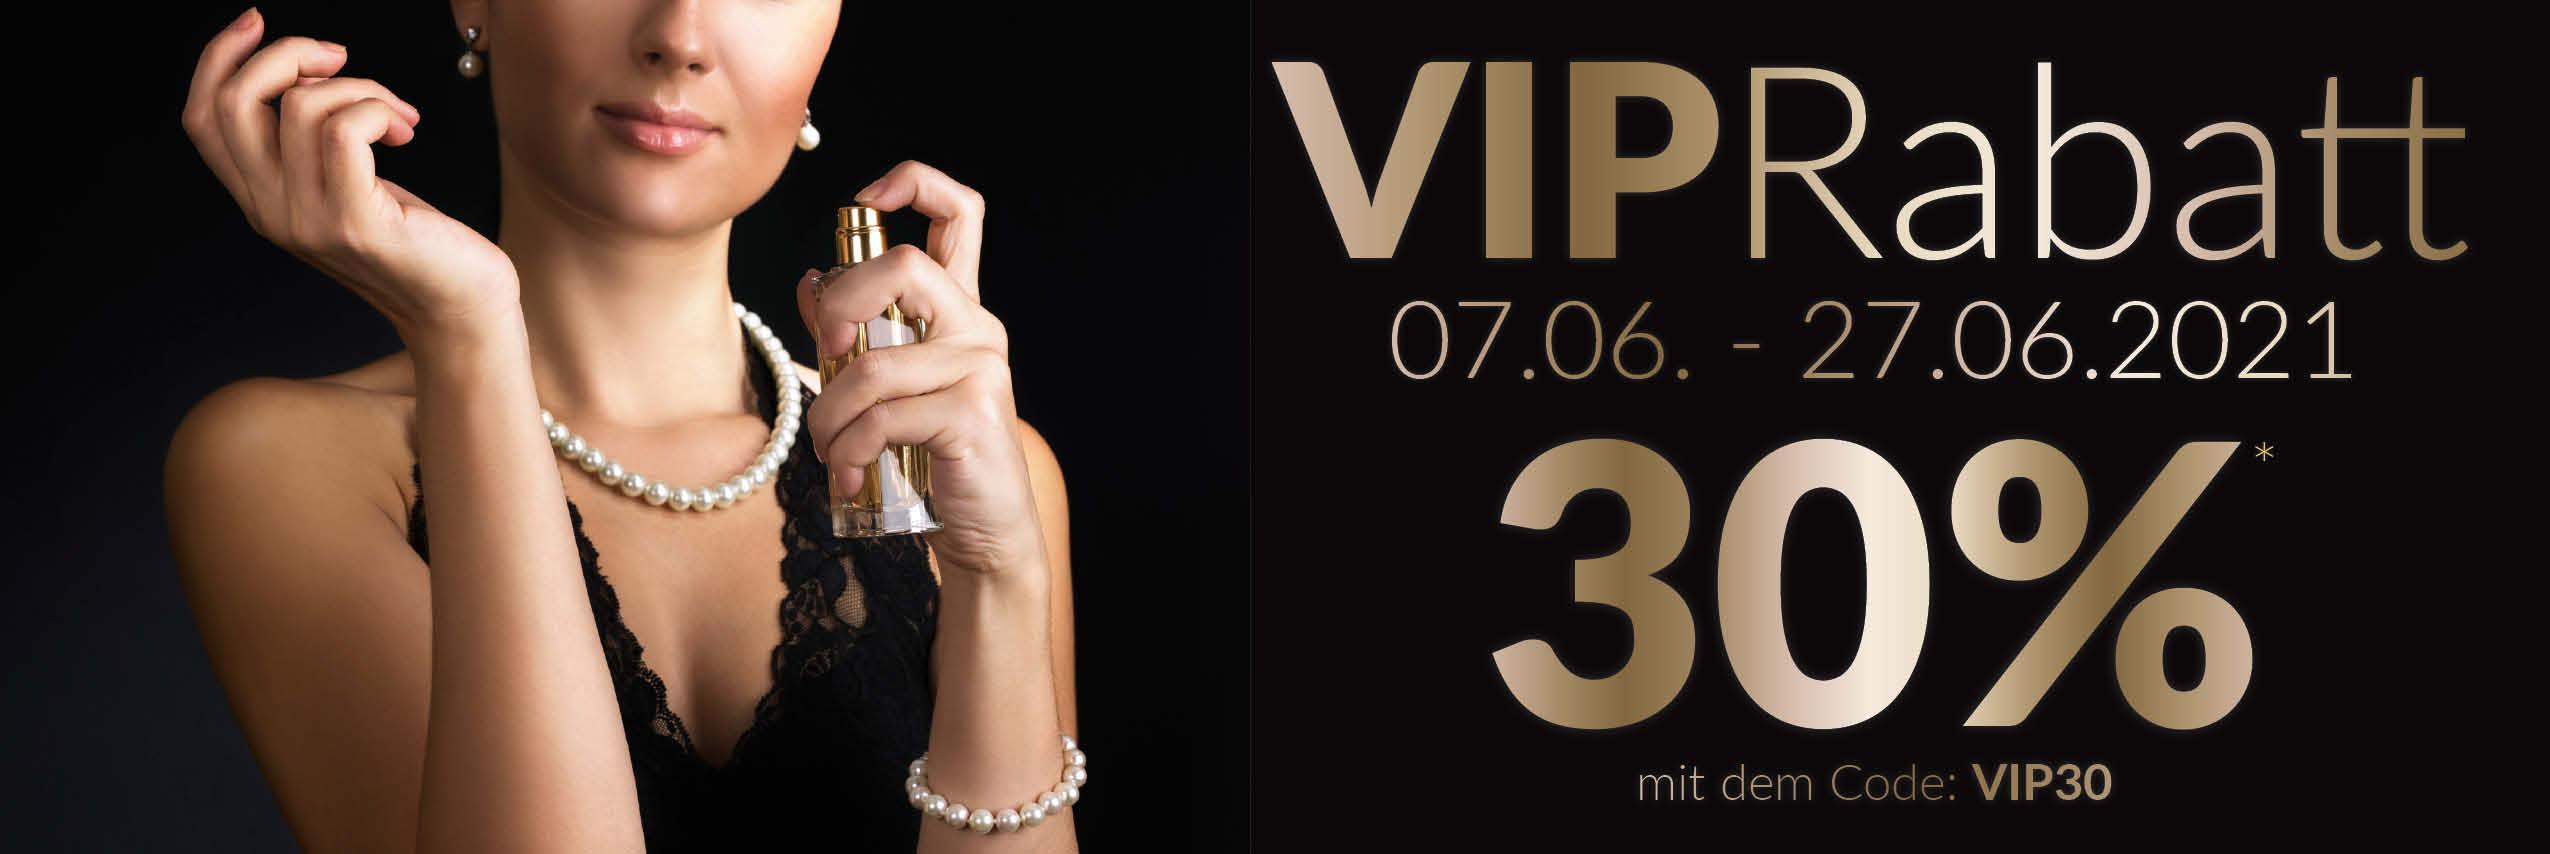 30% VIP Rabatt - jetzt sichern!